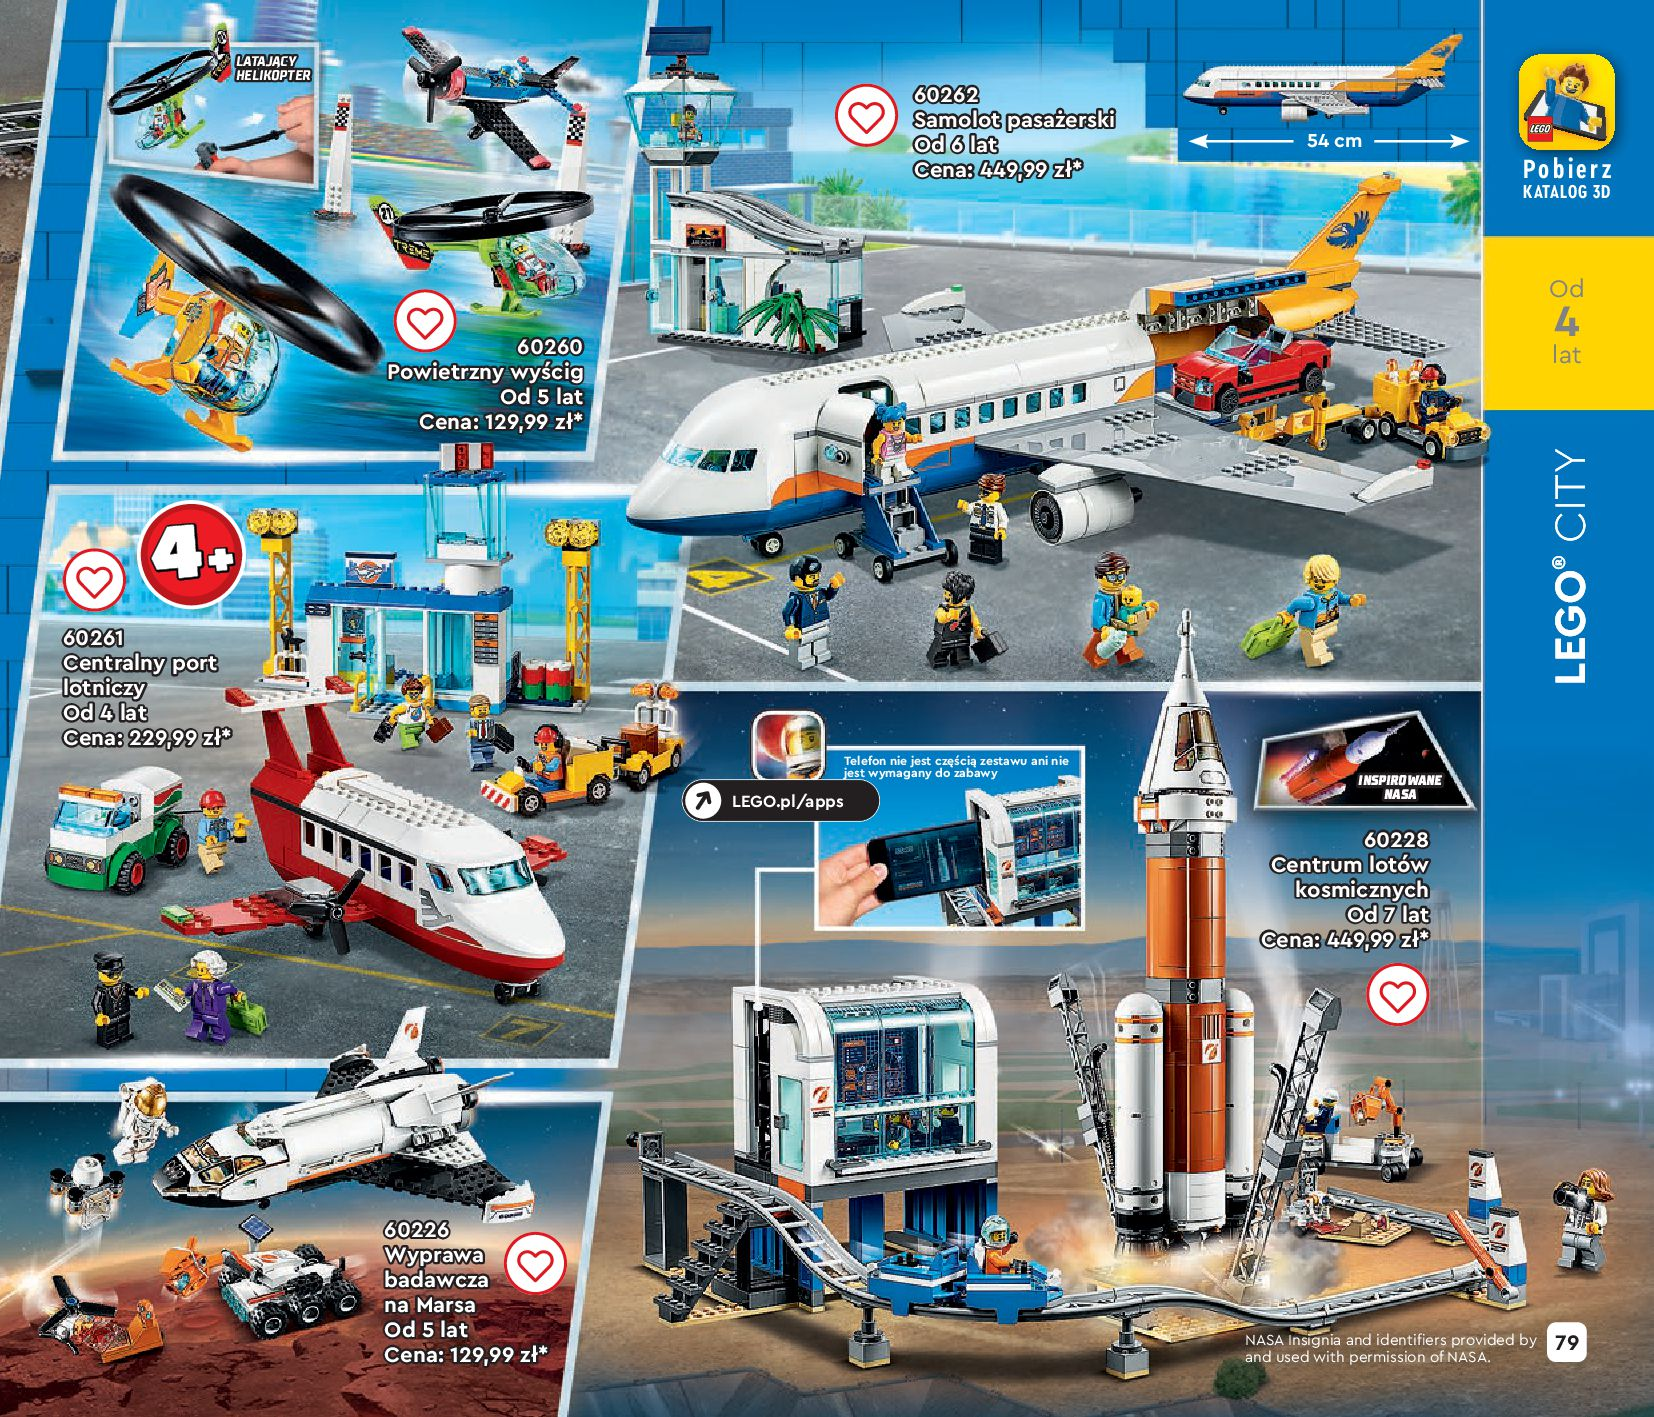 Gazetka LEGO: Gazetka LEGO - katalog 2021-06-30 page-79